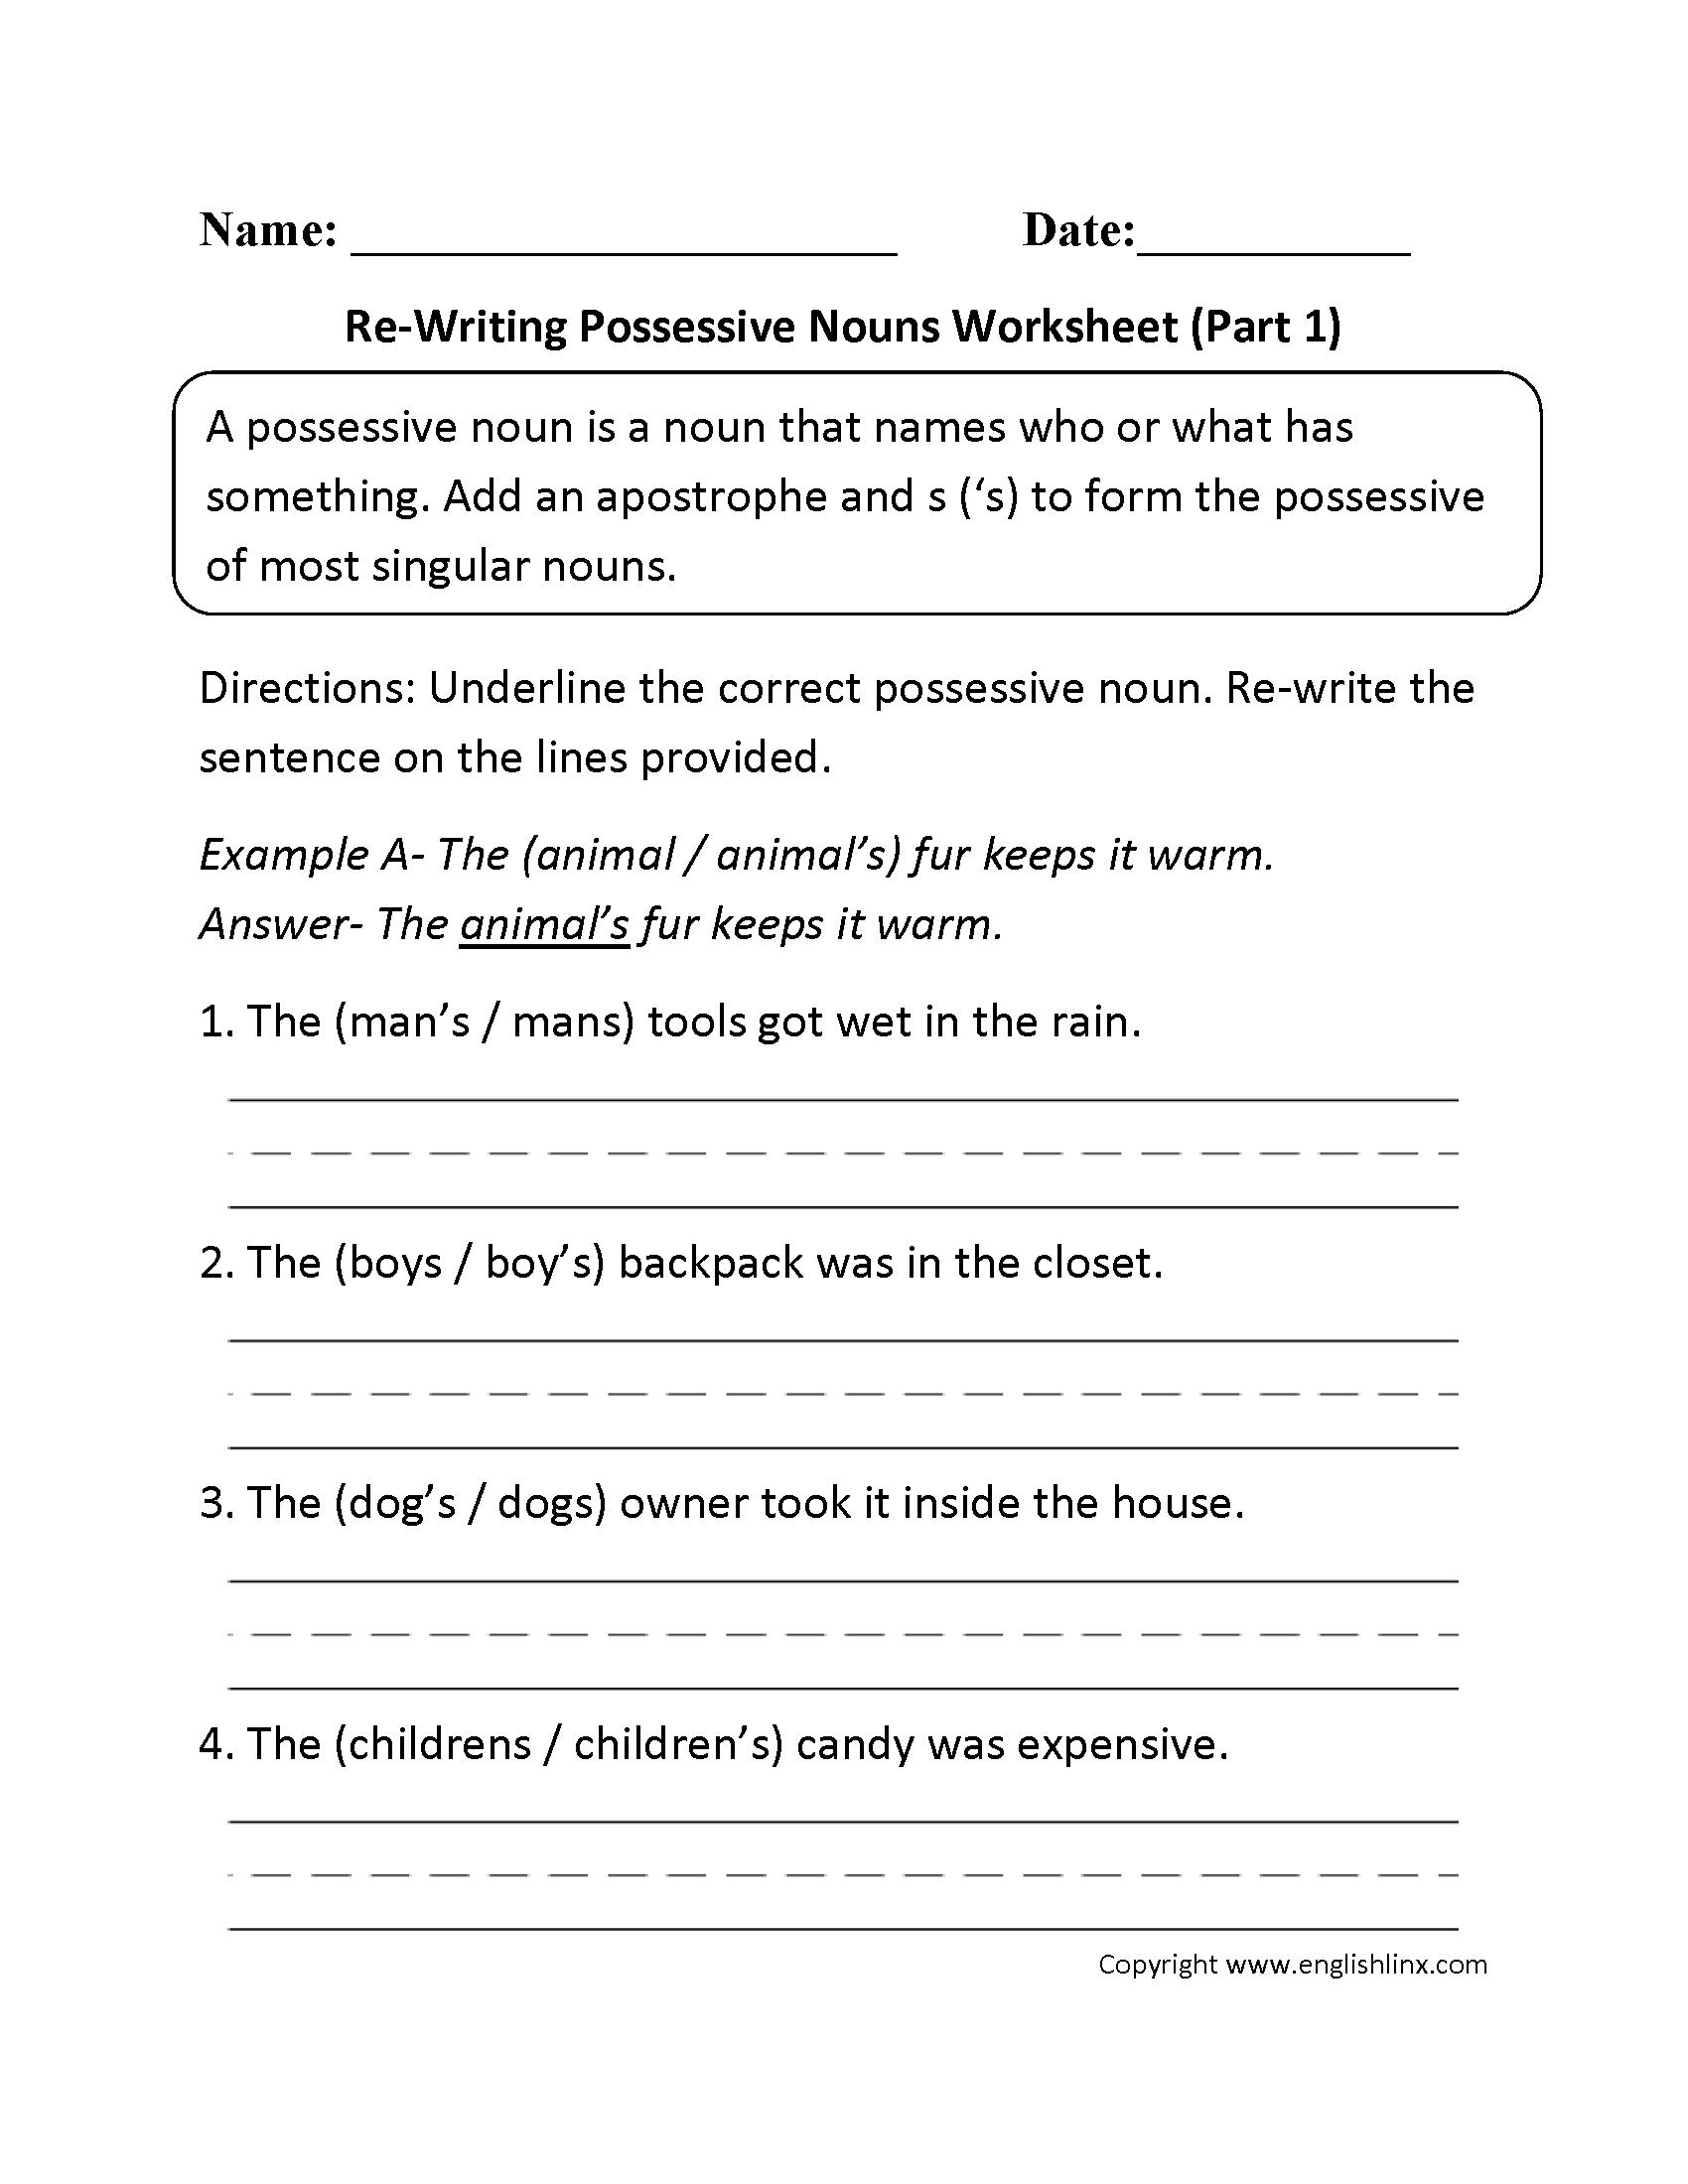 Re Writing Possessive Nouns Worksheet Part 1